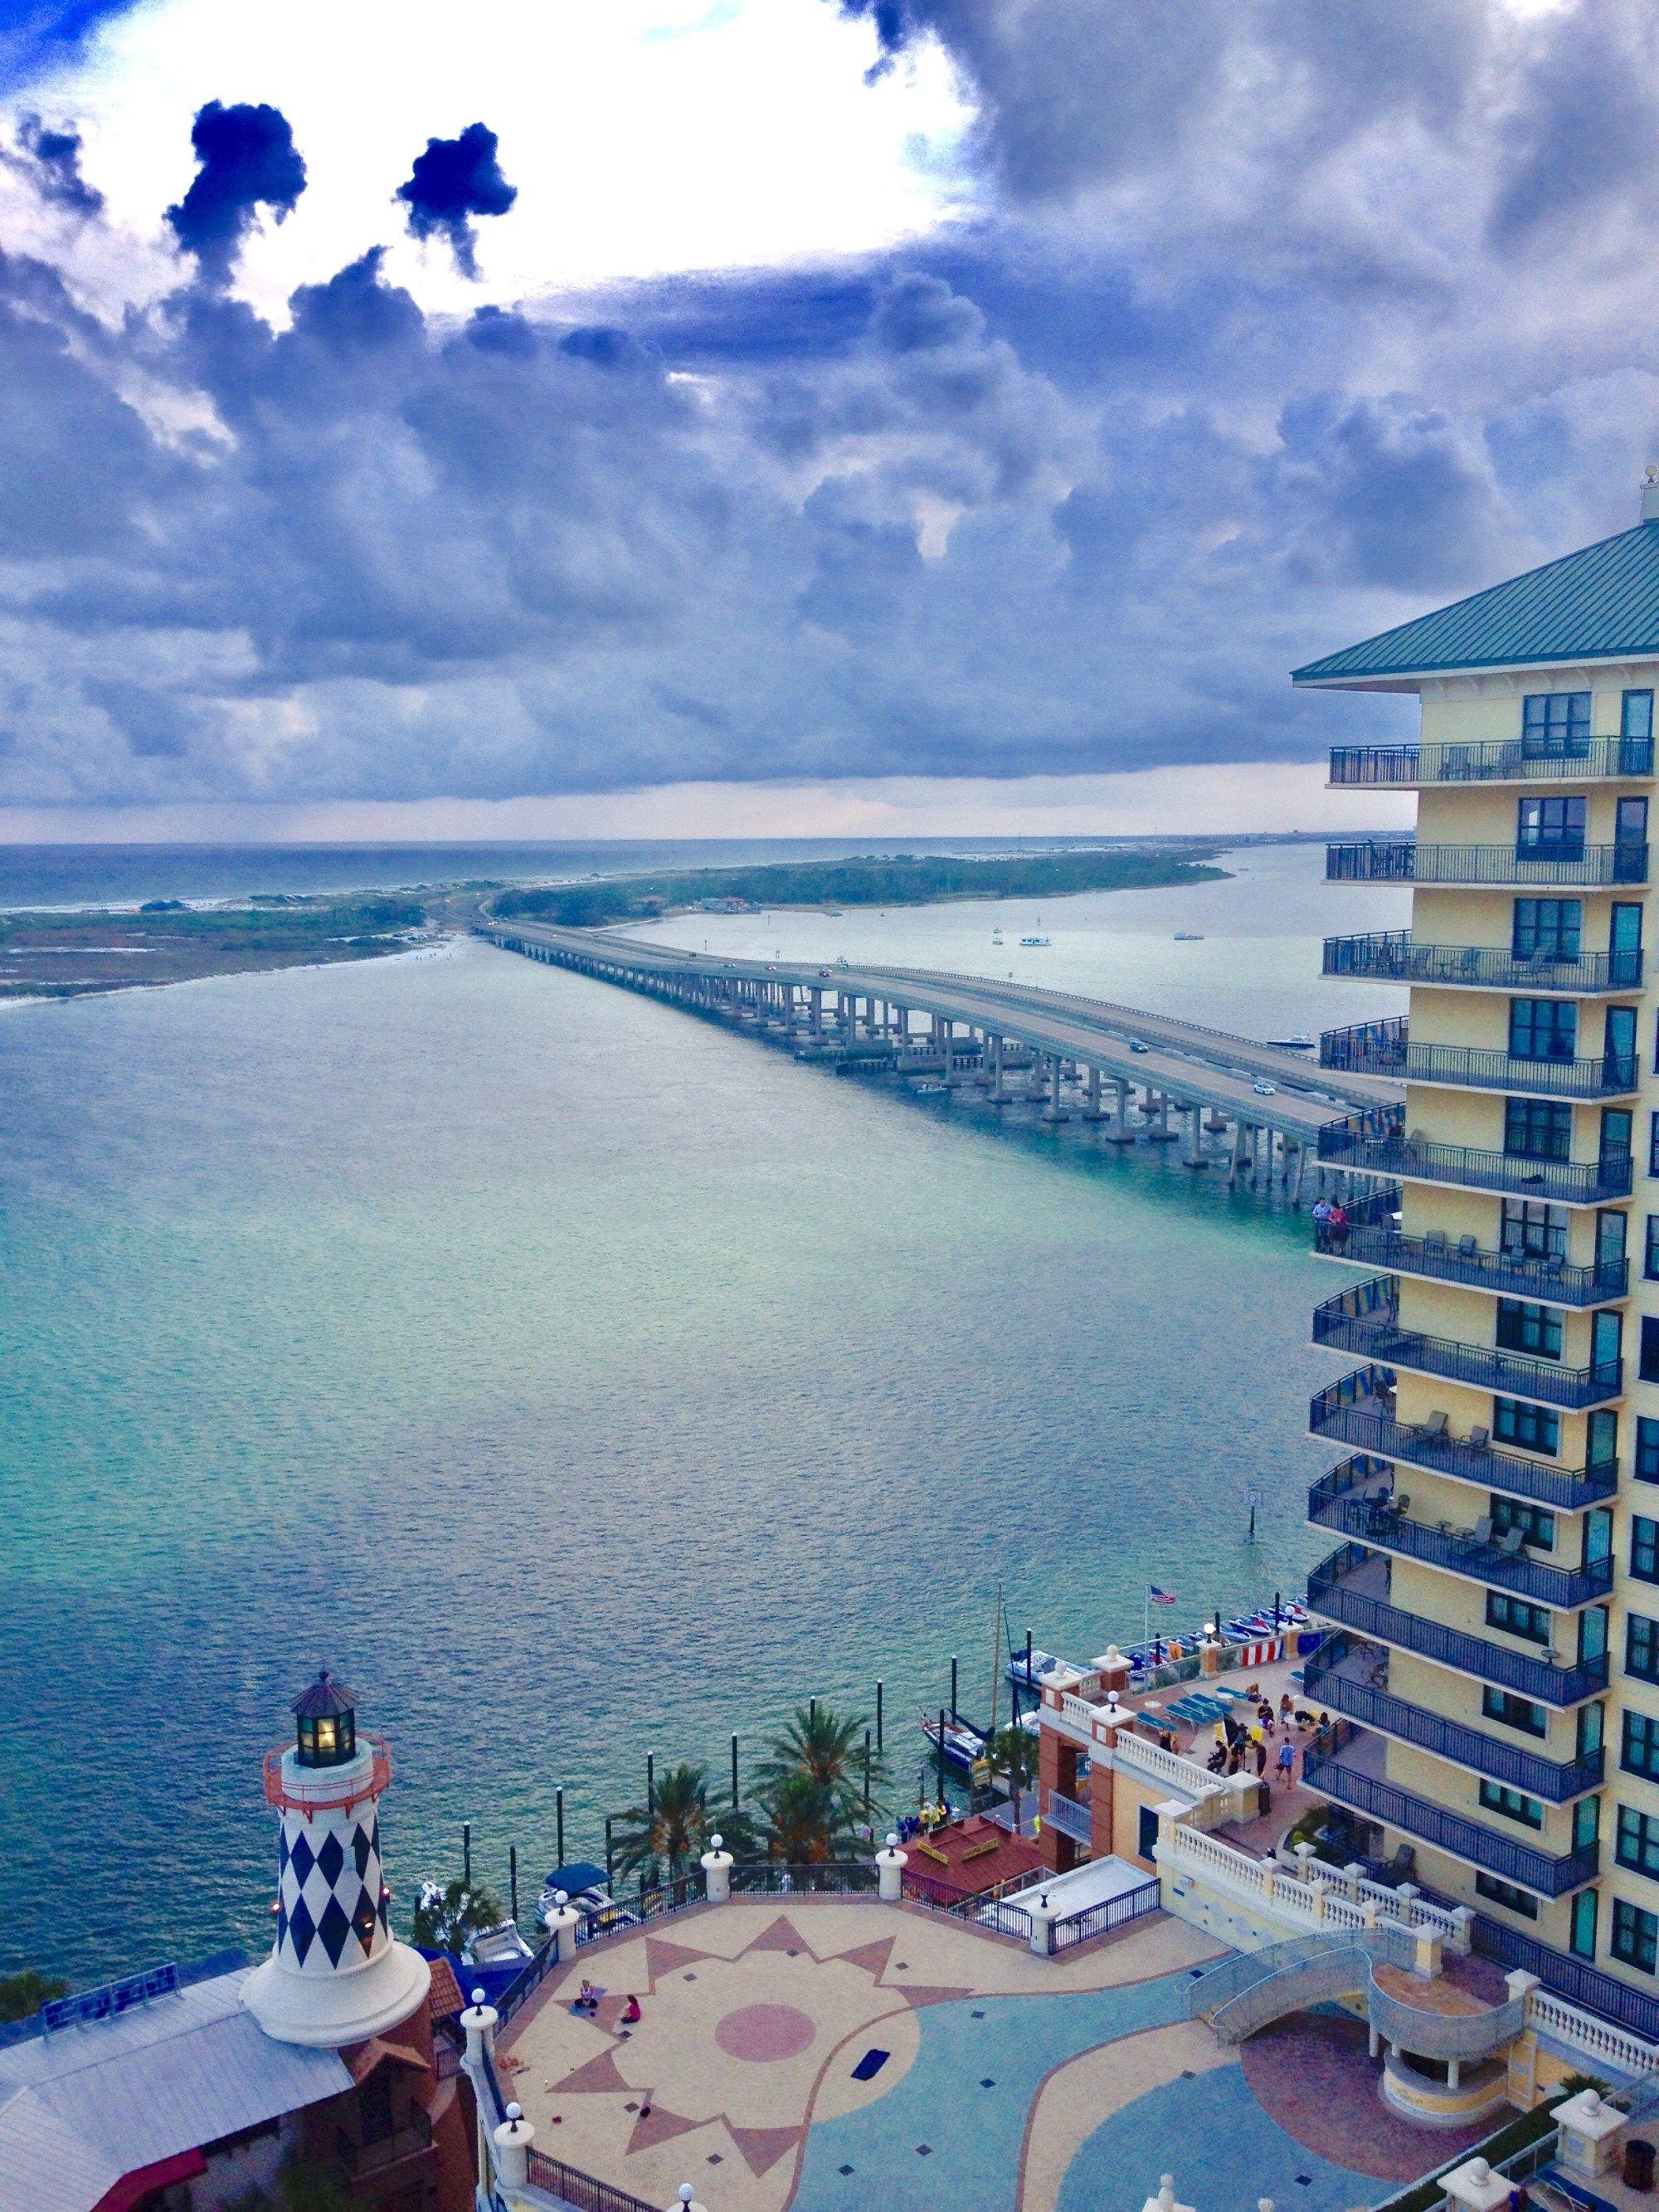 Florida Panhandle Life Part 1 Destin S Harborwalk Cool Places To Visit Orlando Florida Vacation Panhandle Florida